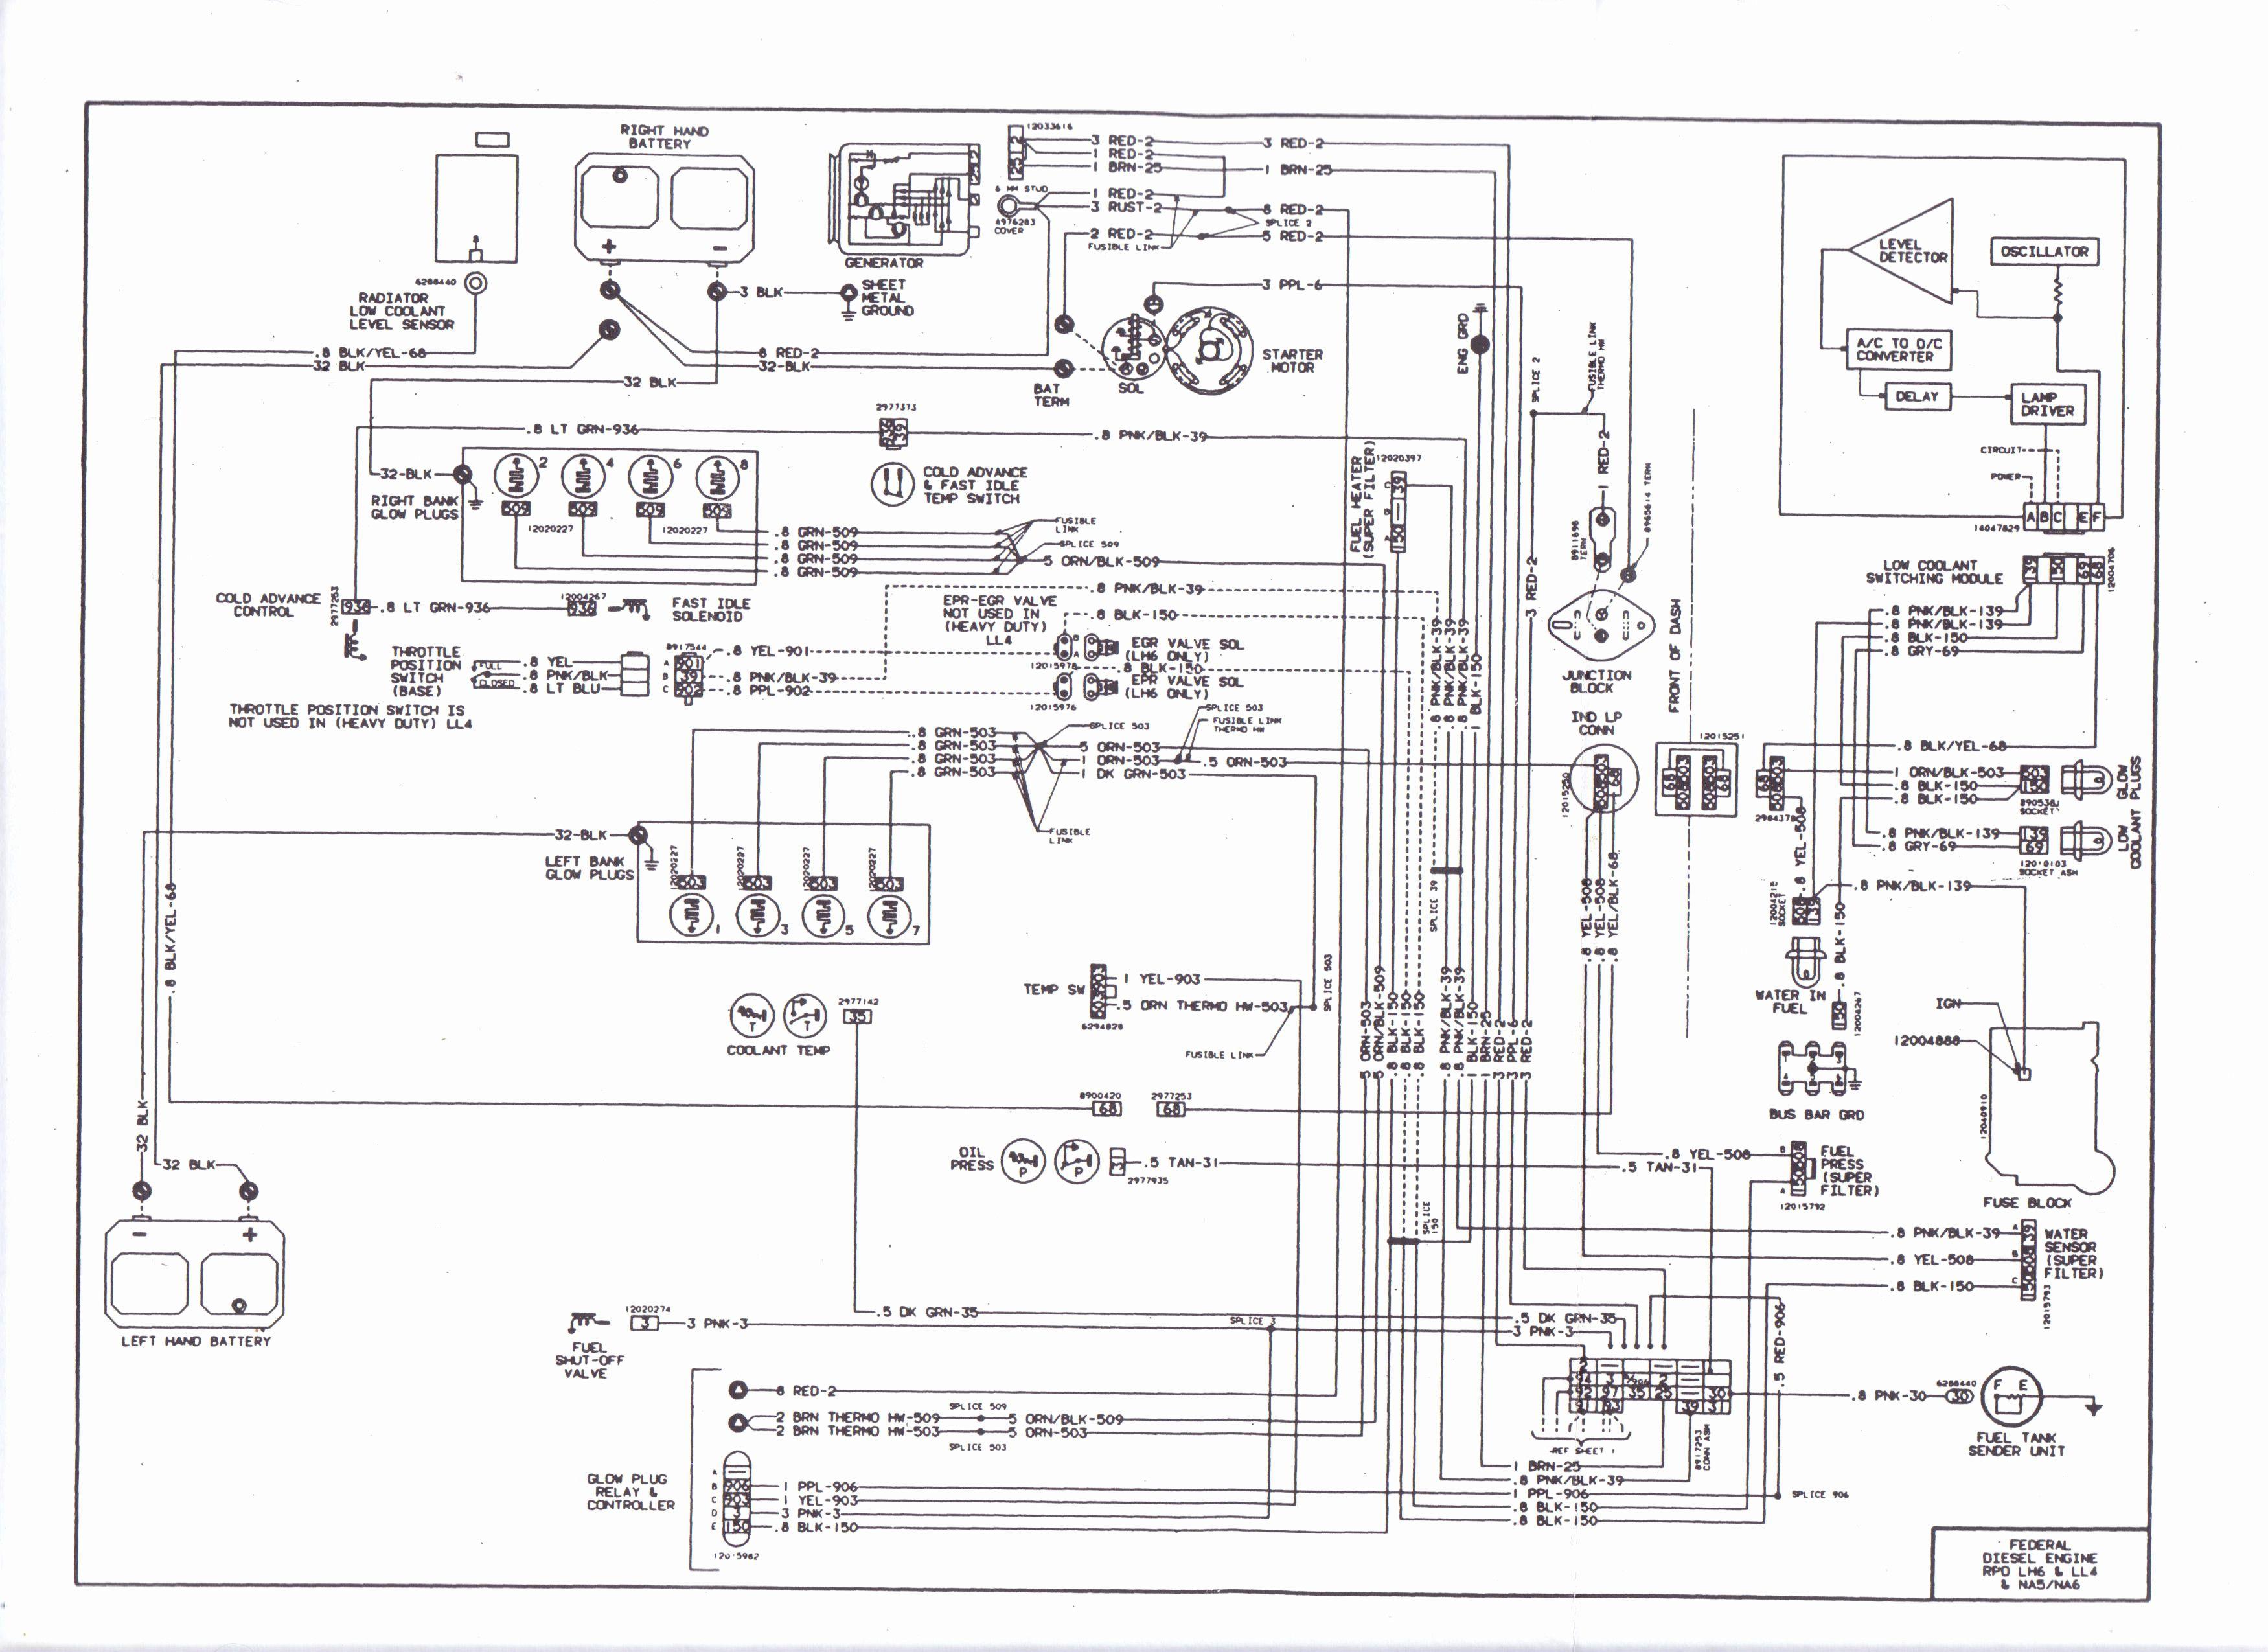 [DIAGRAM_1JK]  26 Best Sample Of Free Electrical Wiring Diagram Software ,  https://bacamajalah.com/26-best-sample-of-fre… | Electrical wiring diagram,  Diagram, Electrical problems | Fox Mustang Wiring Diagram |  | Pinterest